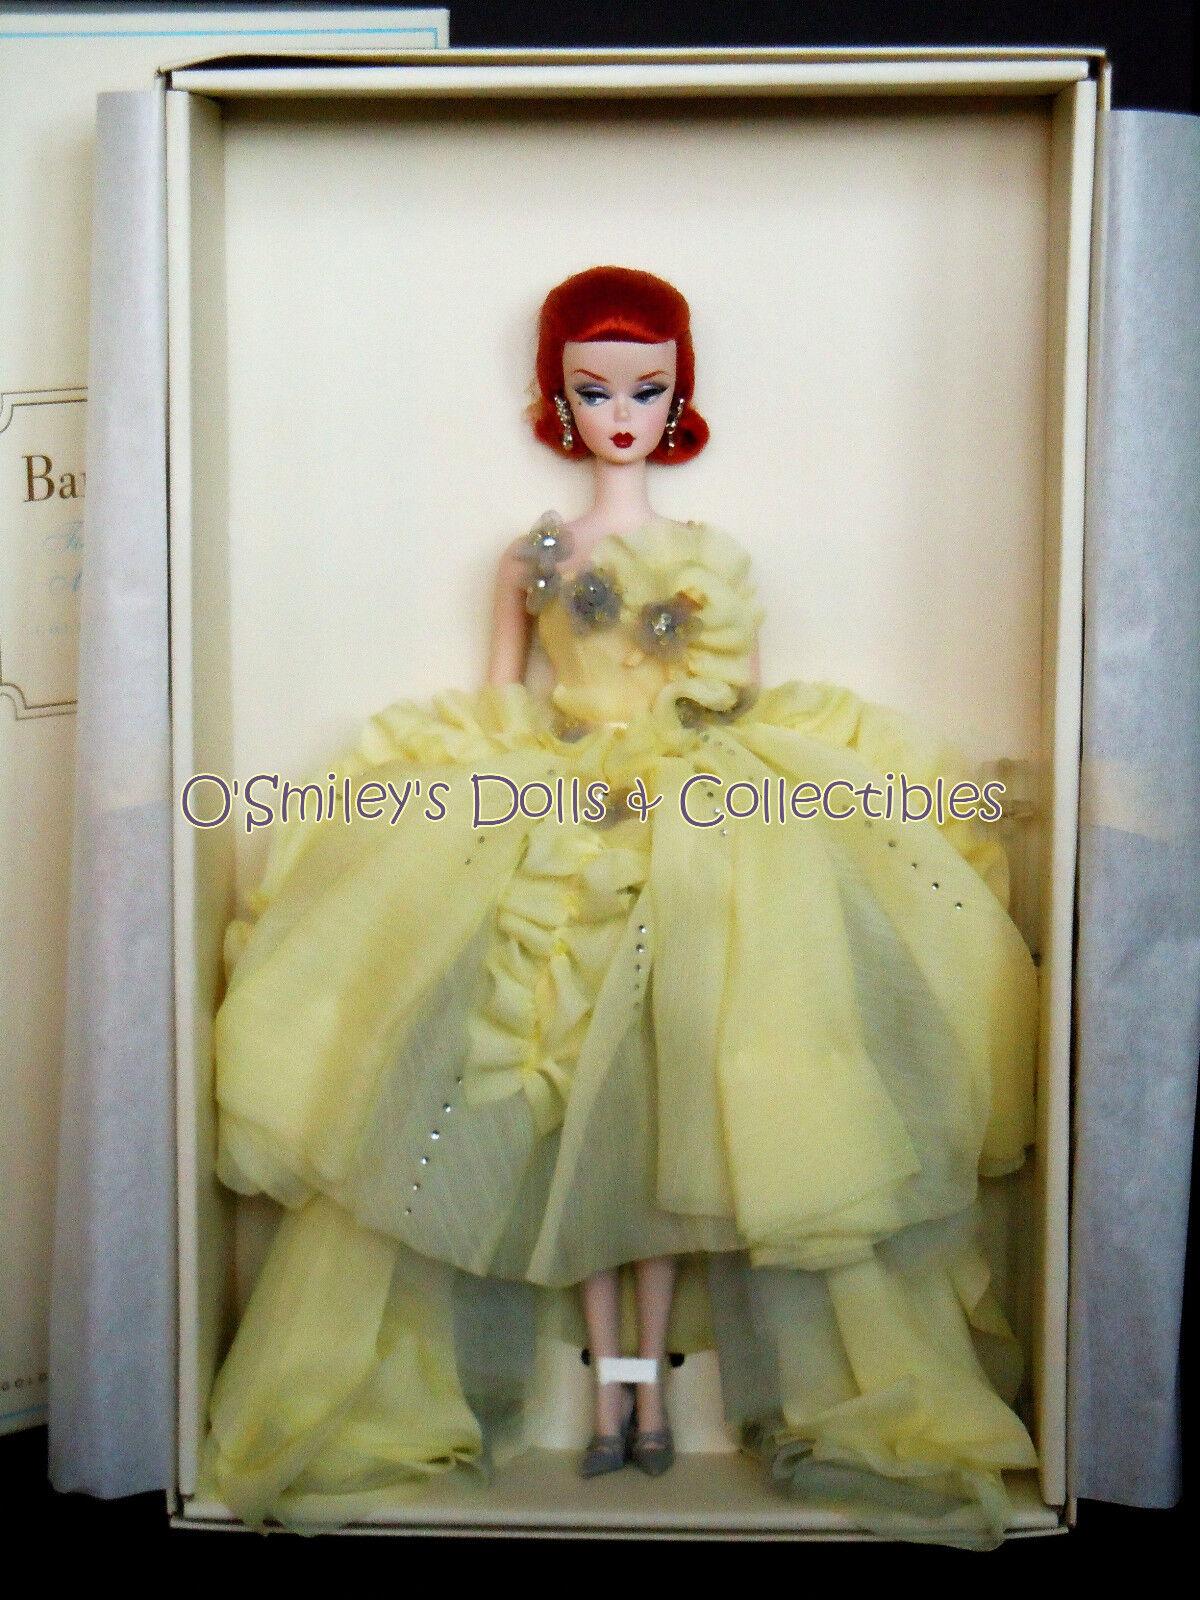 Gala Vestido 2012 Bfmc Cali Muñeca oro Label 6500 (rojohead) barbie_w3496_nrfb